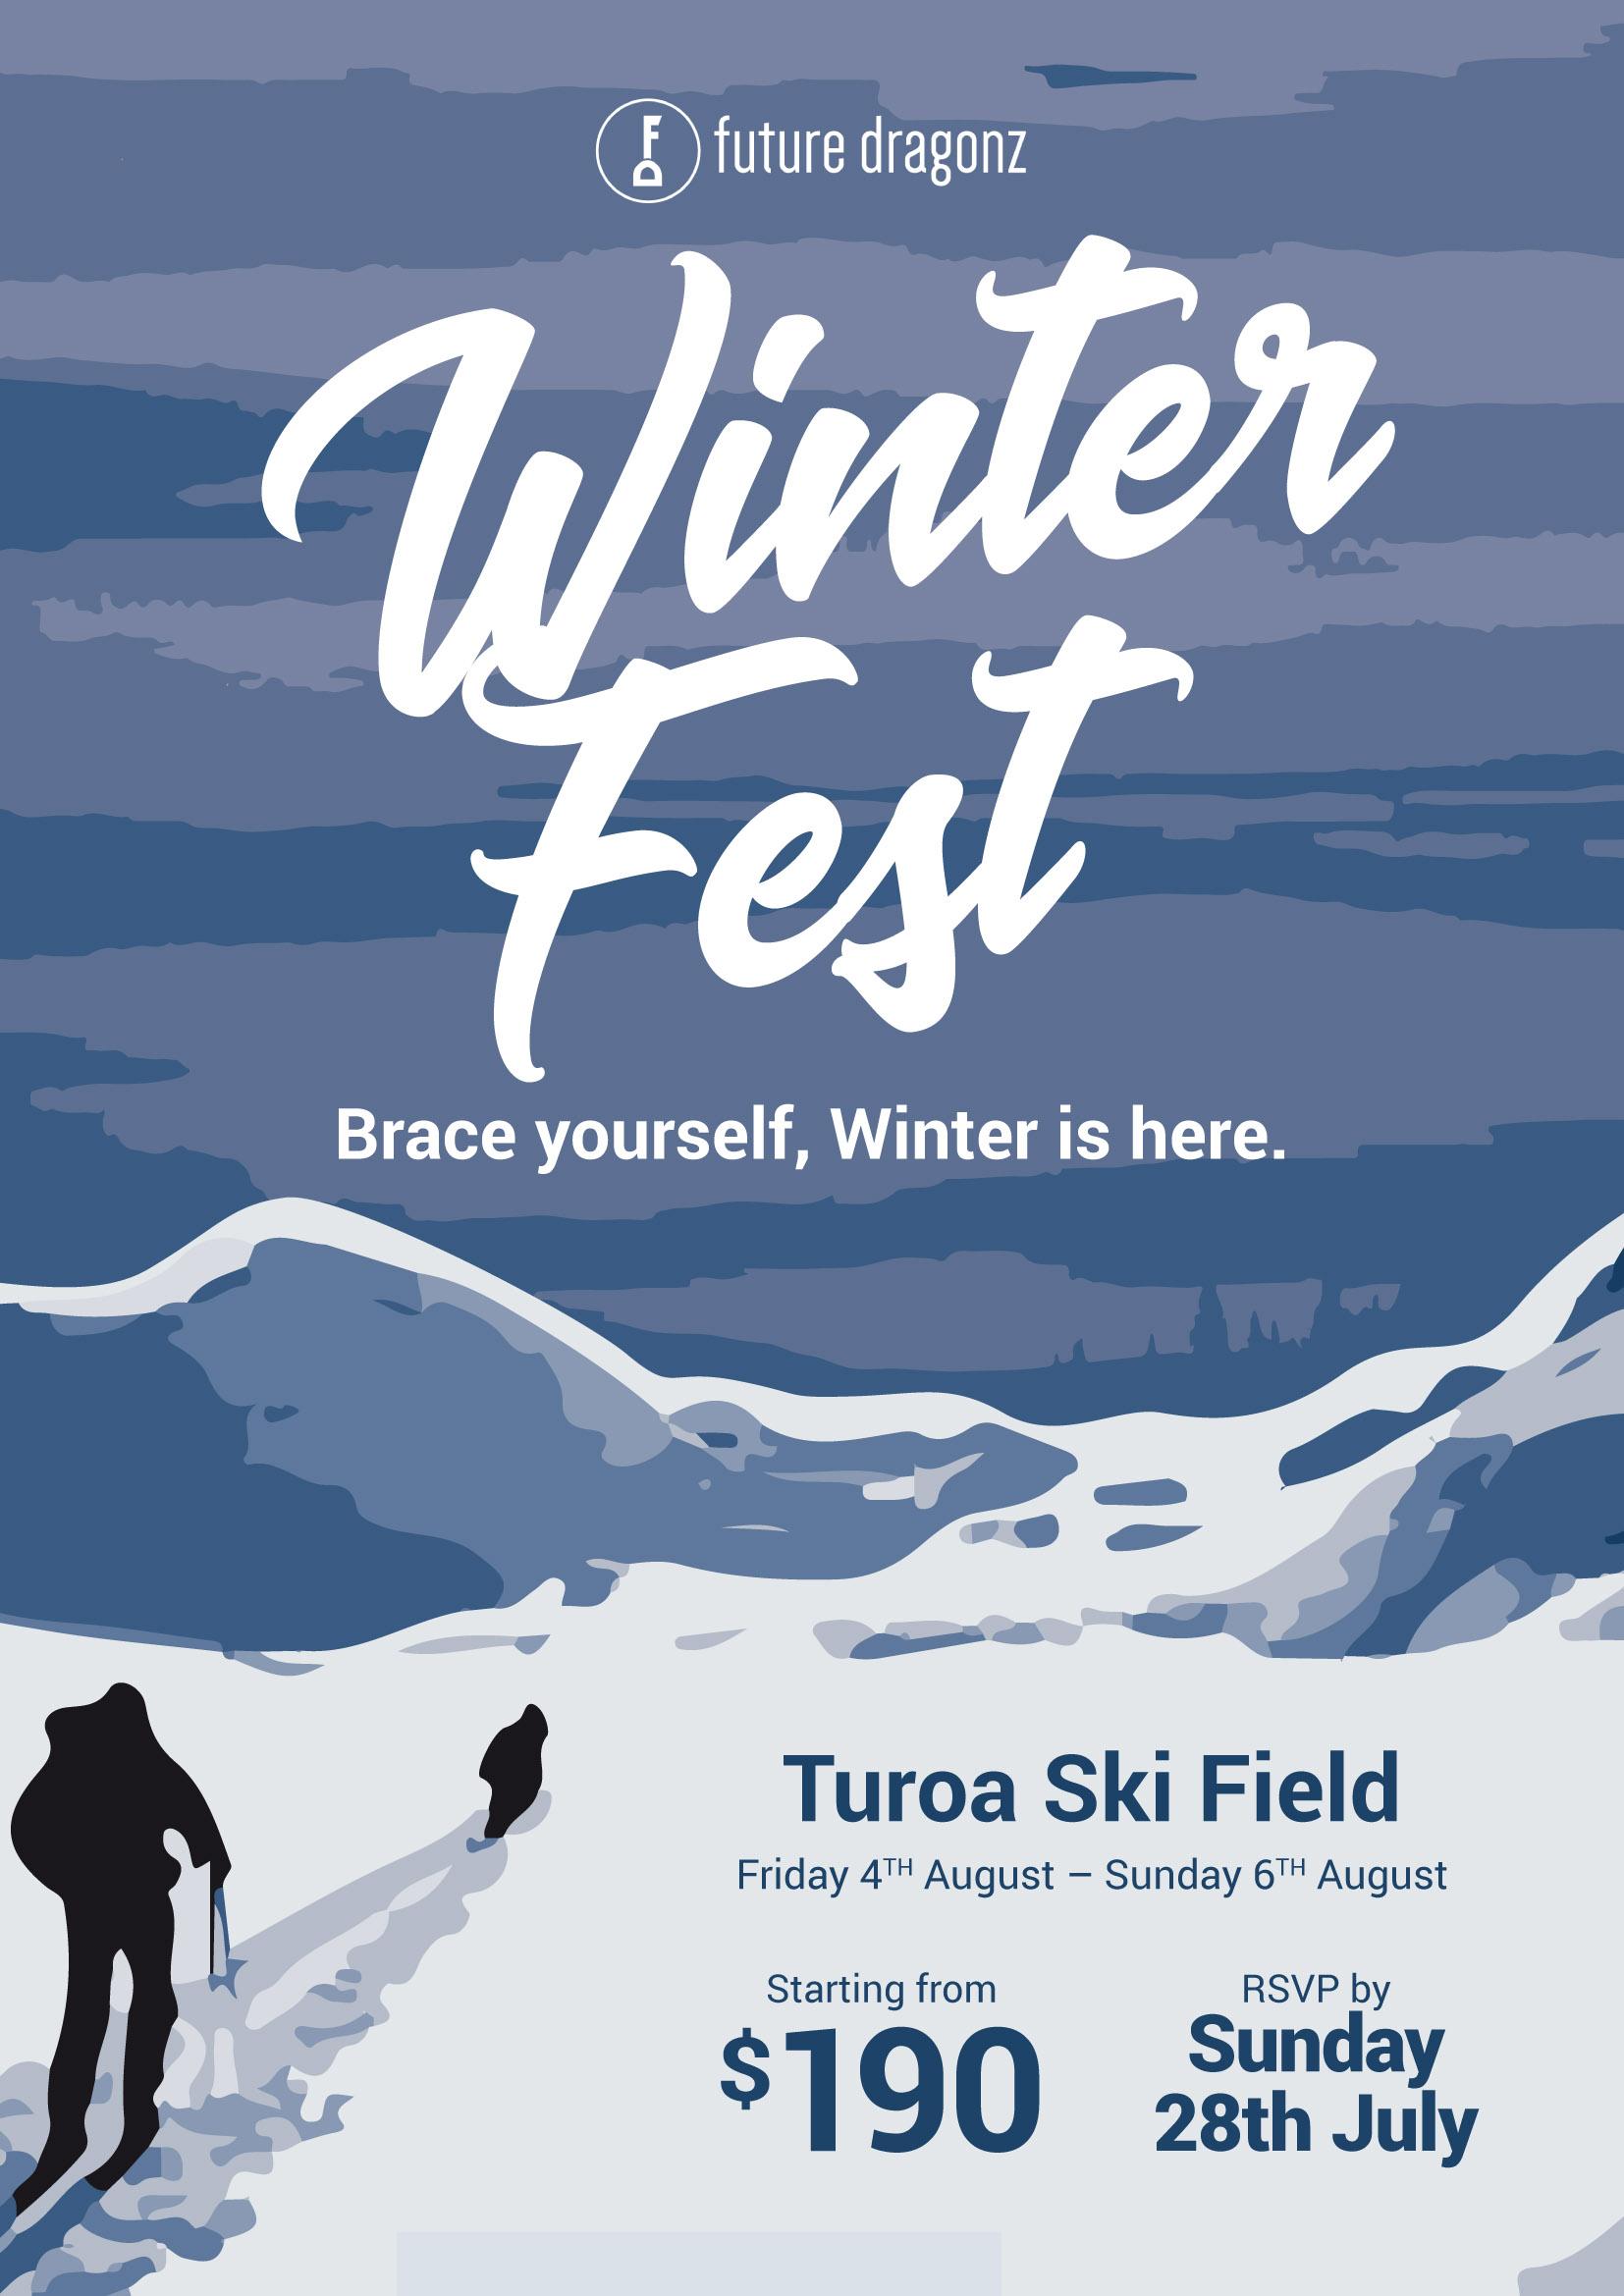 Winter-Fest-Future-Dragonz-1.jpg